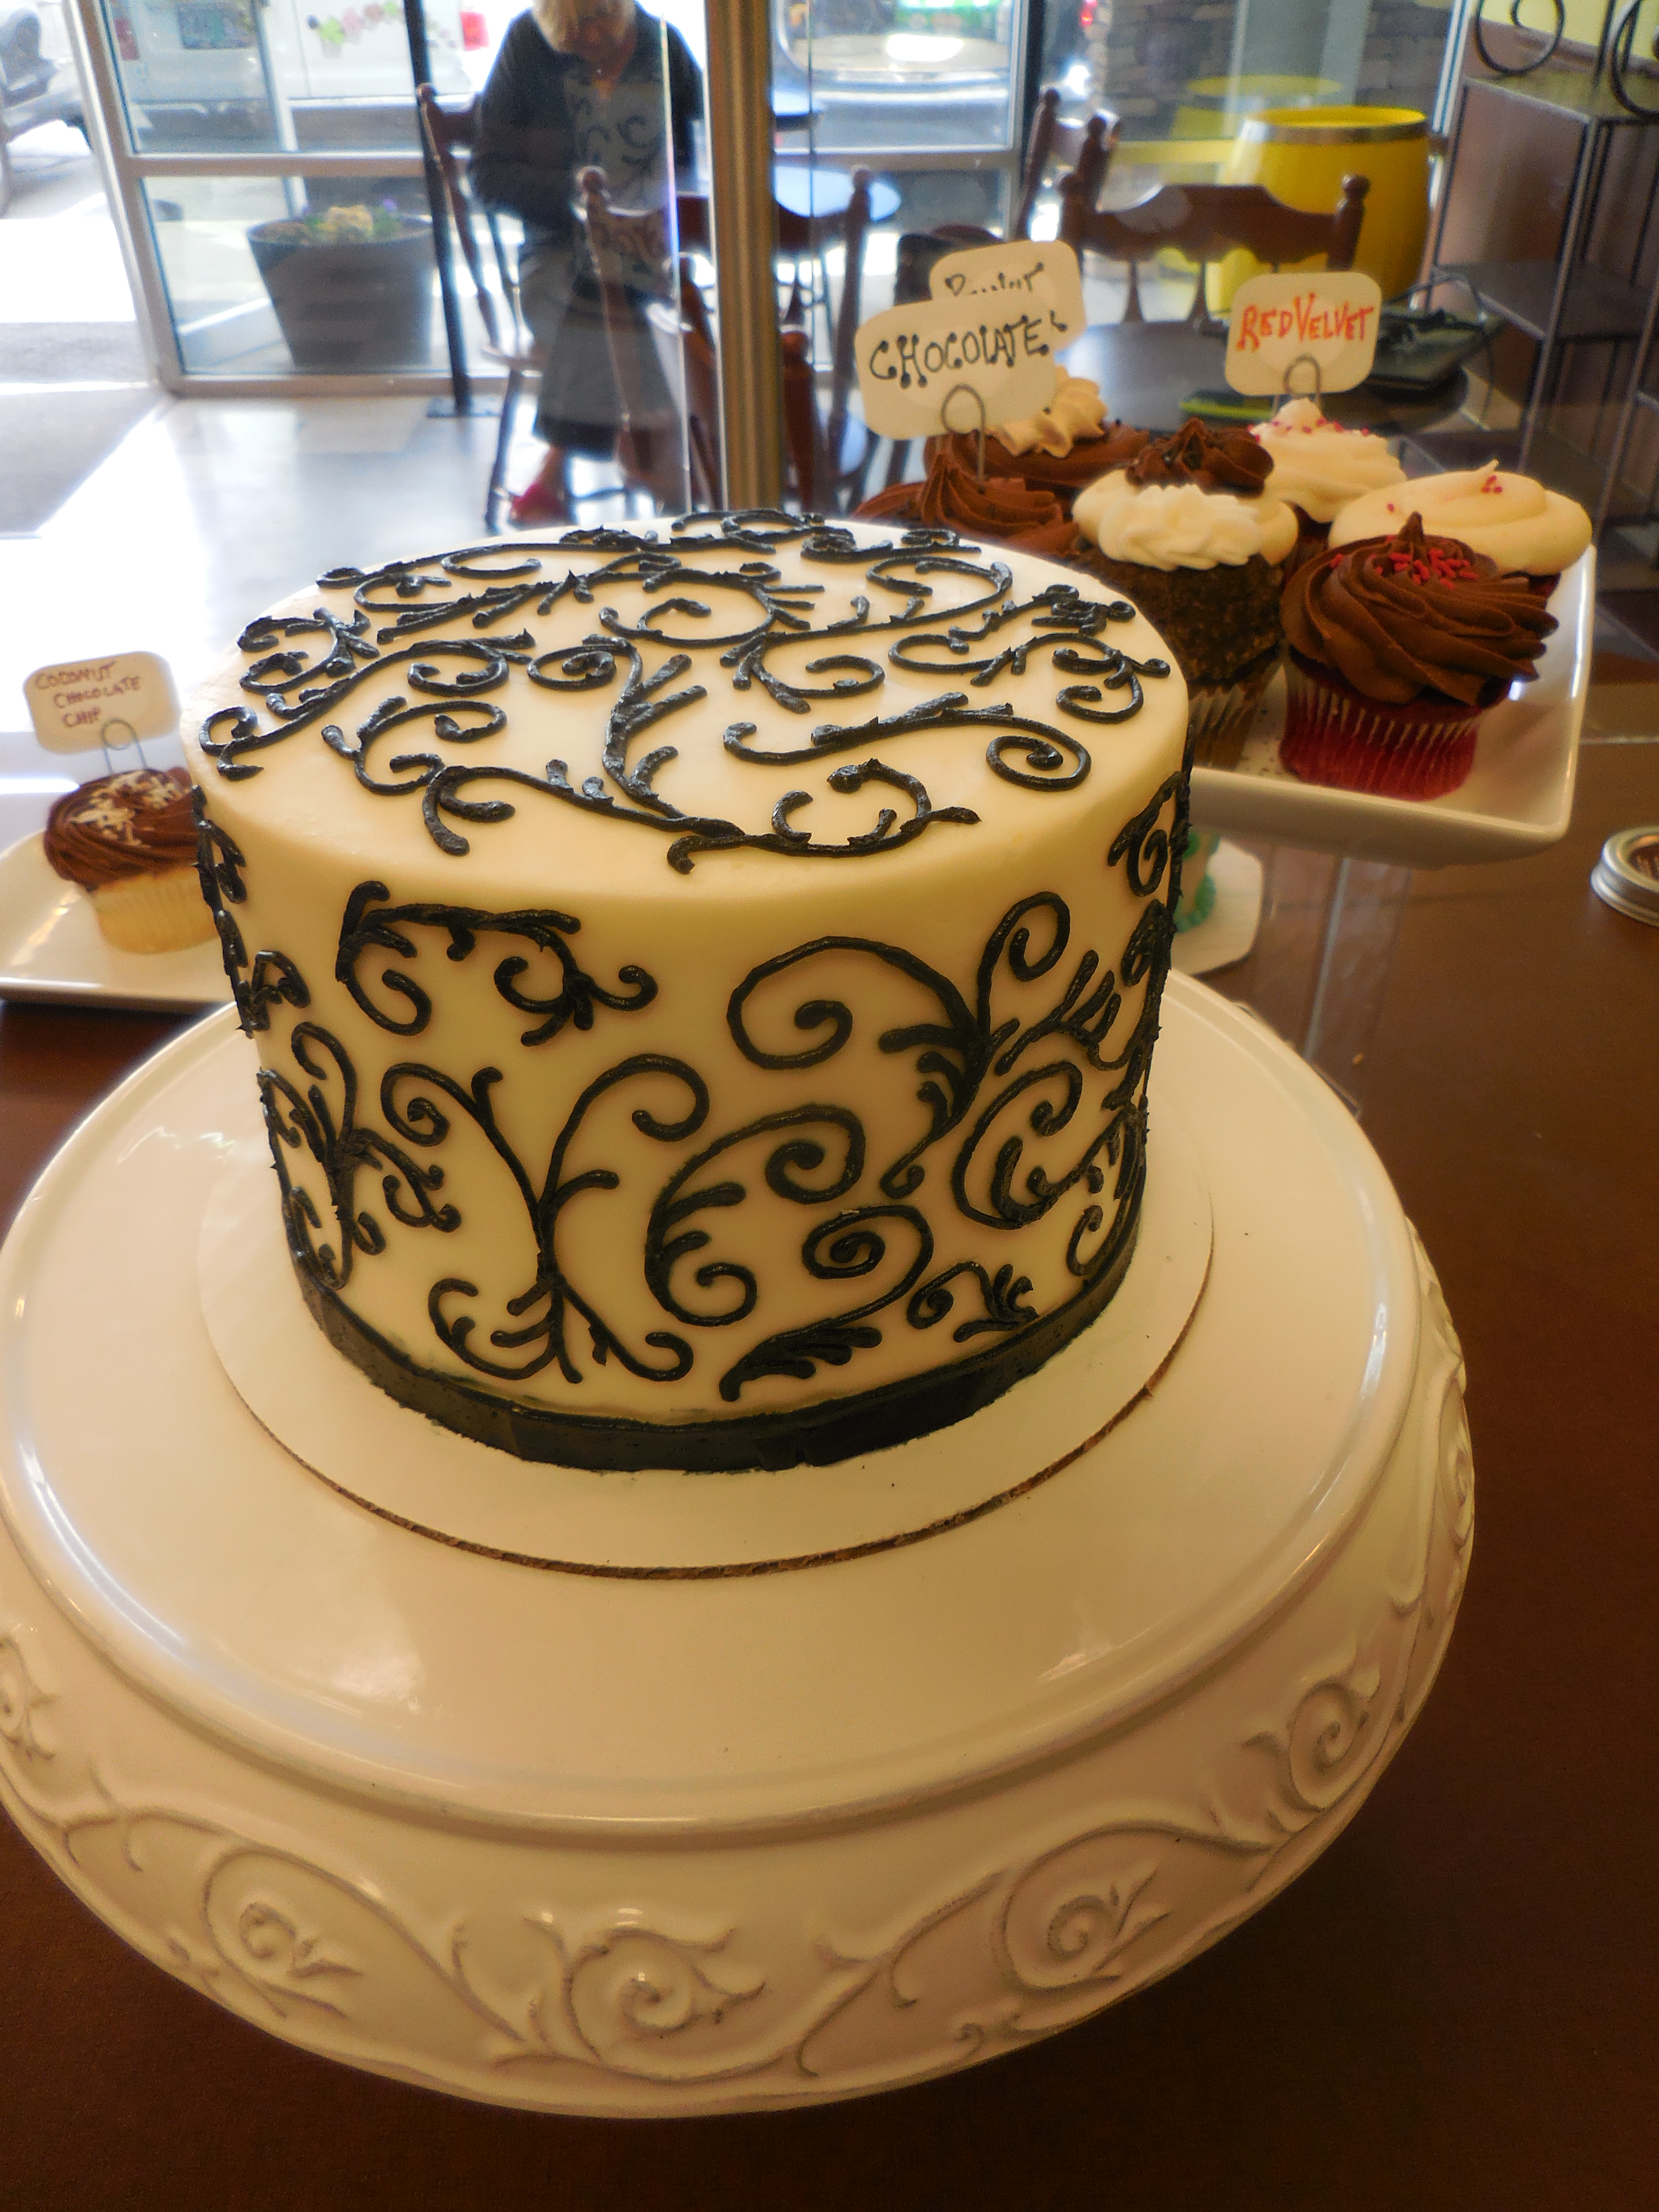 Custom Decorated Cakes - Ida's Cupcake Cafe